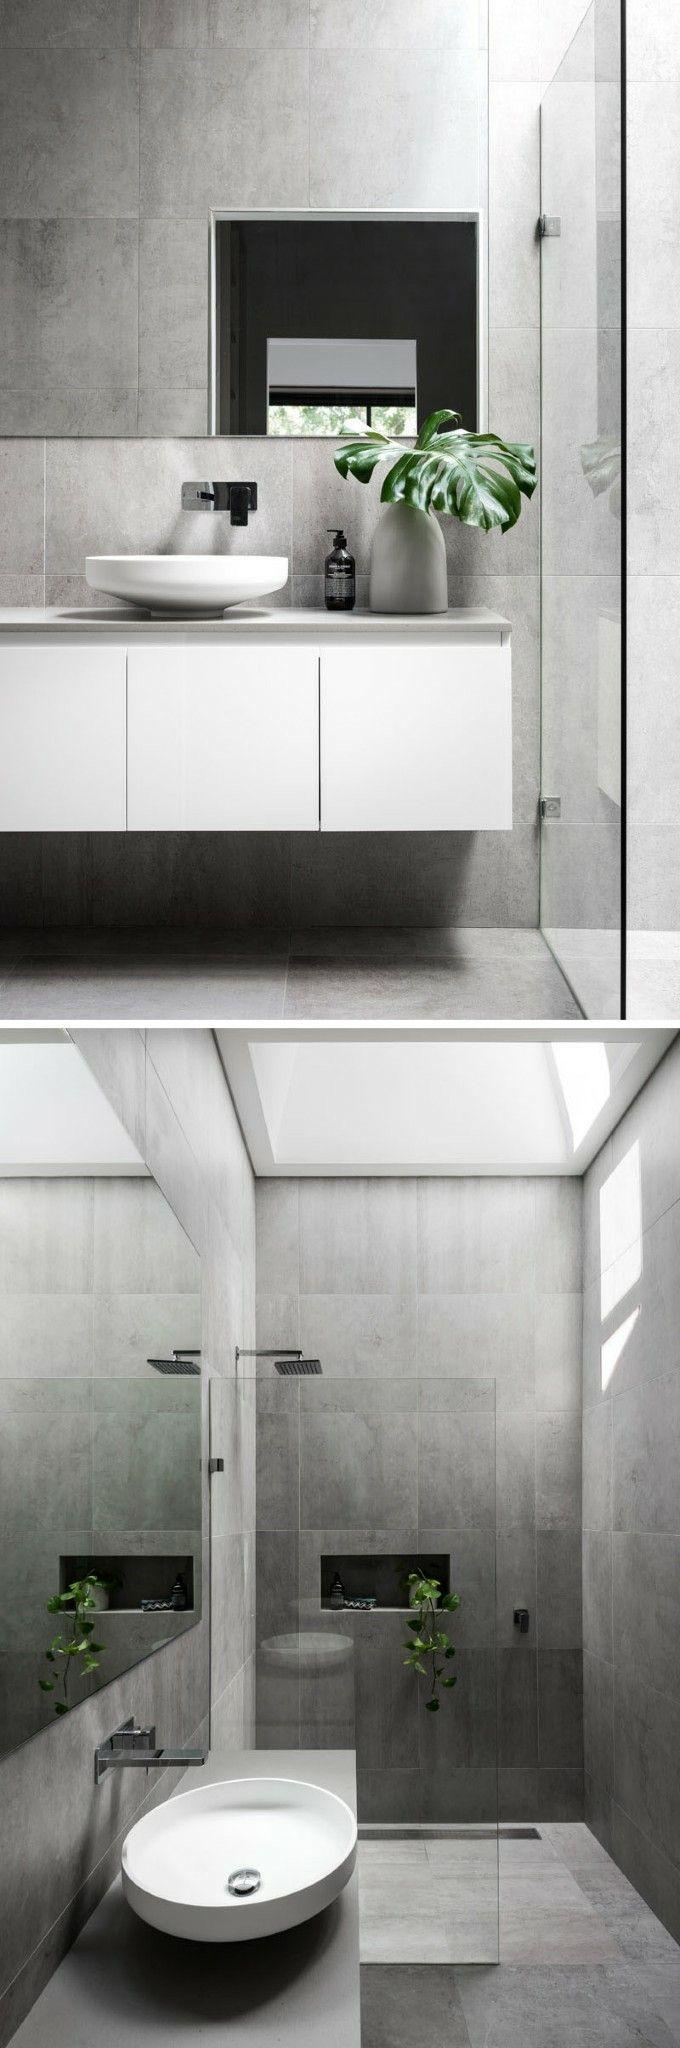 Panneaux Stratifies Salle De Bain Leroy Merlin ~ a little splash of greenery makes all the difference au toilette